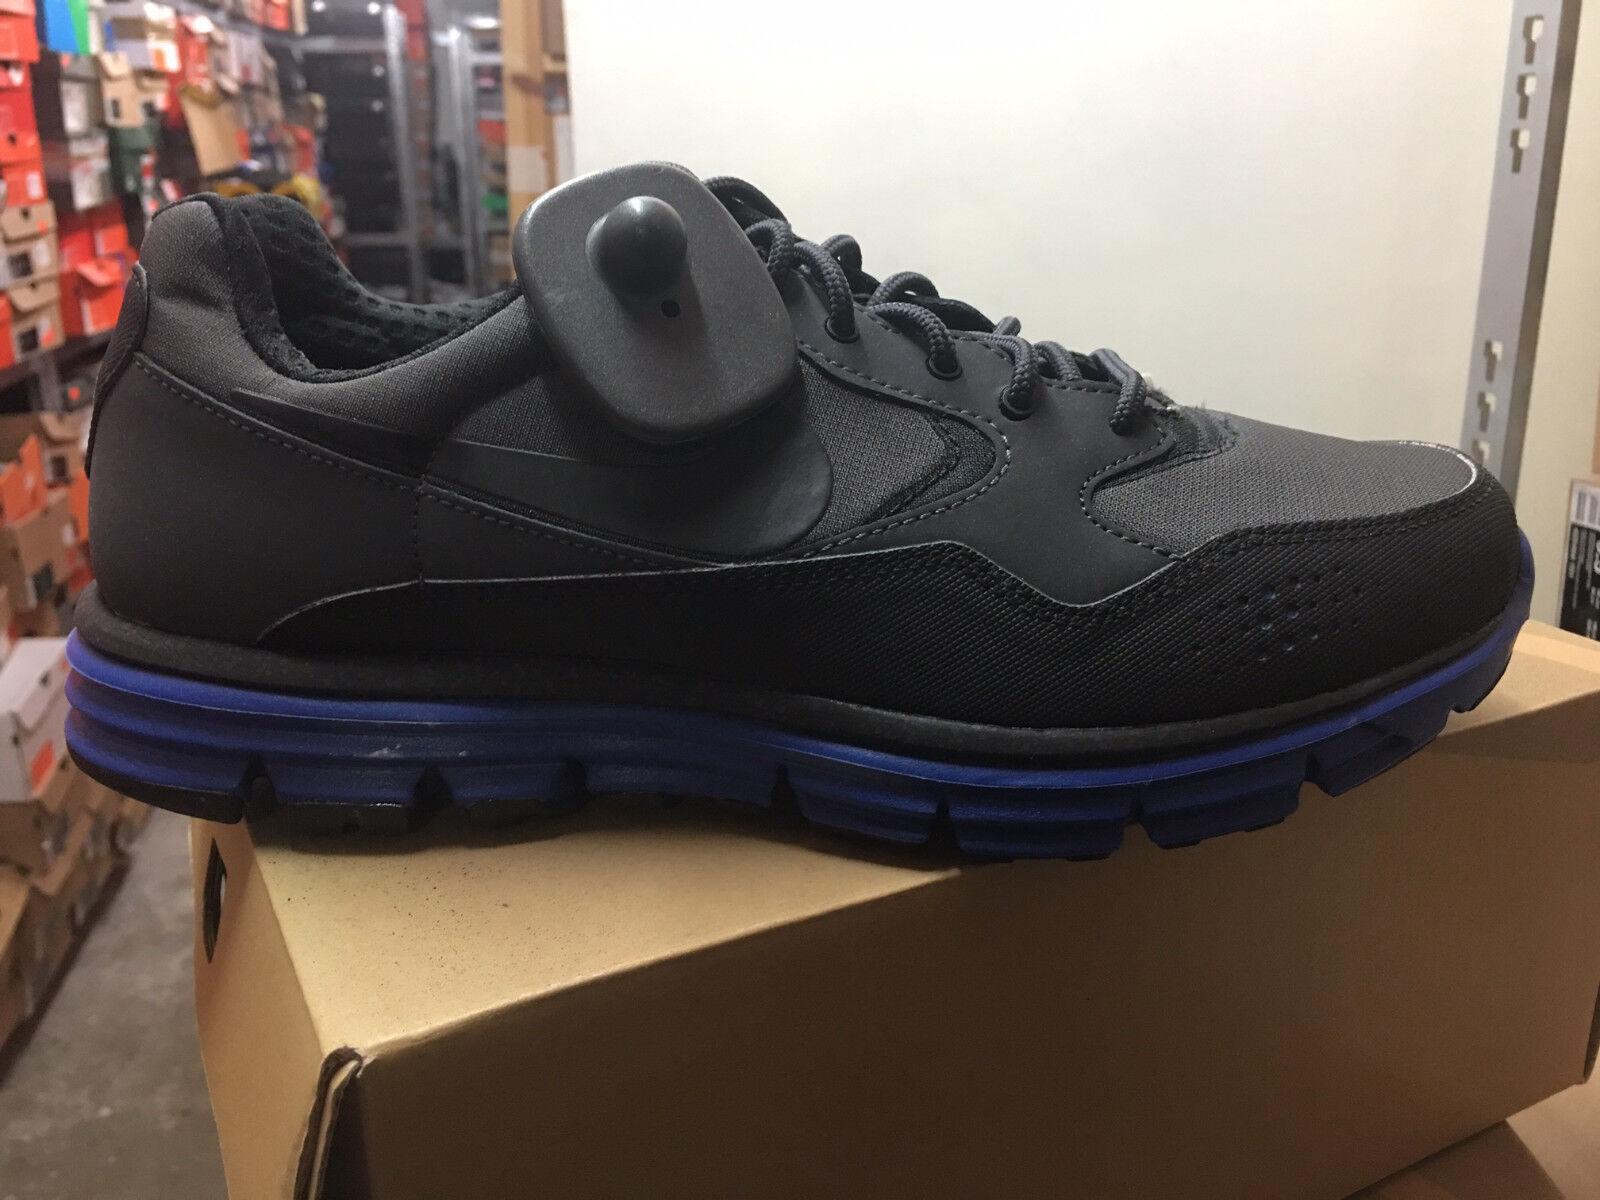 NIKE Lunar Wood+ Sneaker Schuhe Gr:43 Grau/Blau Trendiger Alltags Schuh Neu